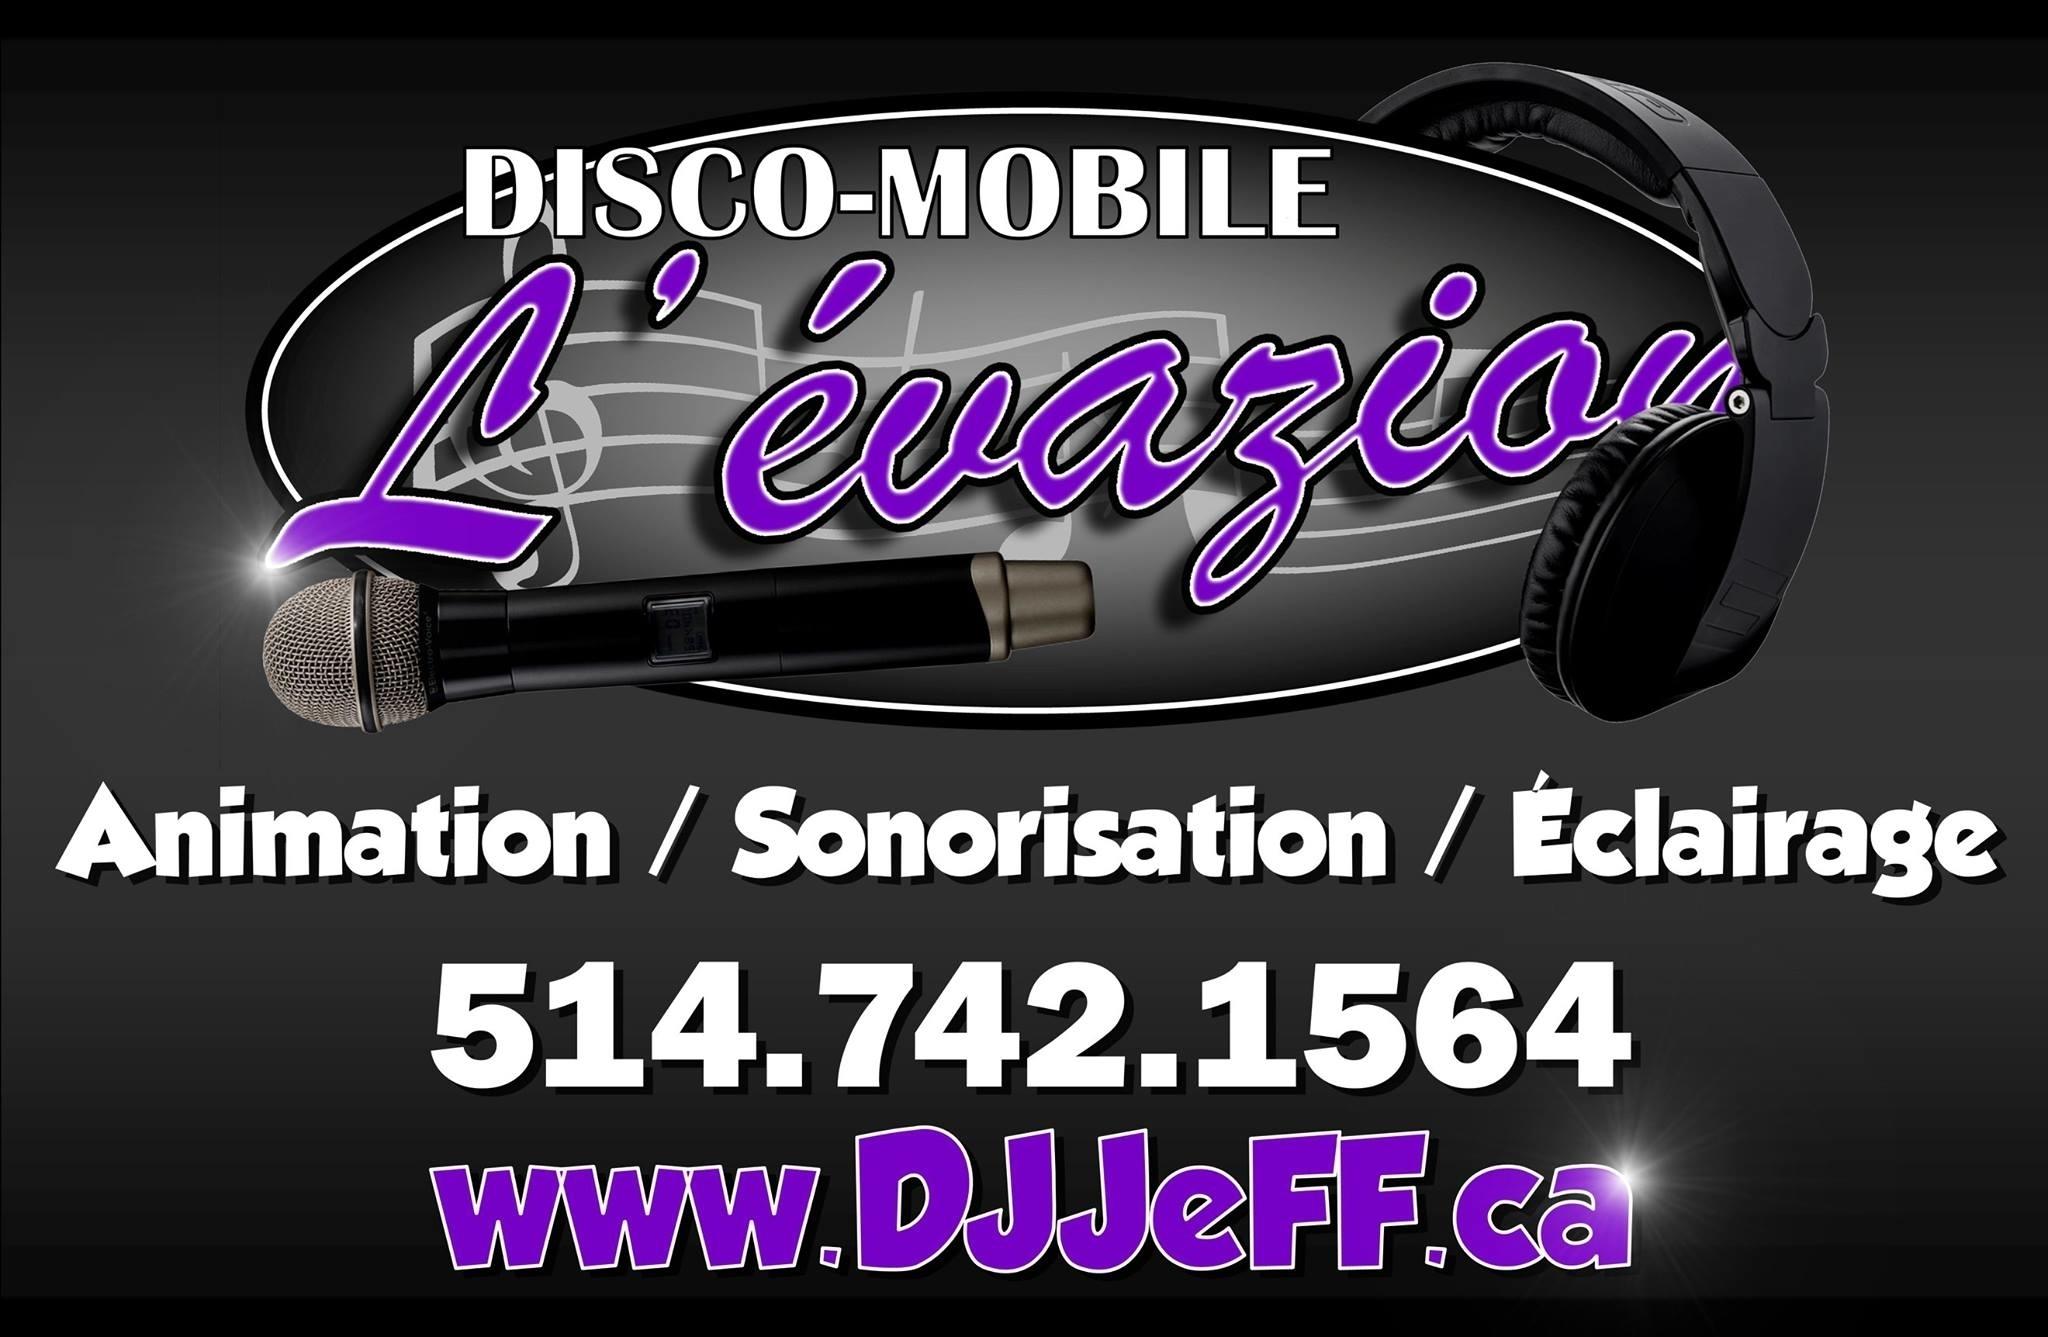 Disco-Mobile l'Évazion - Dj Service